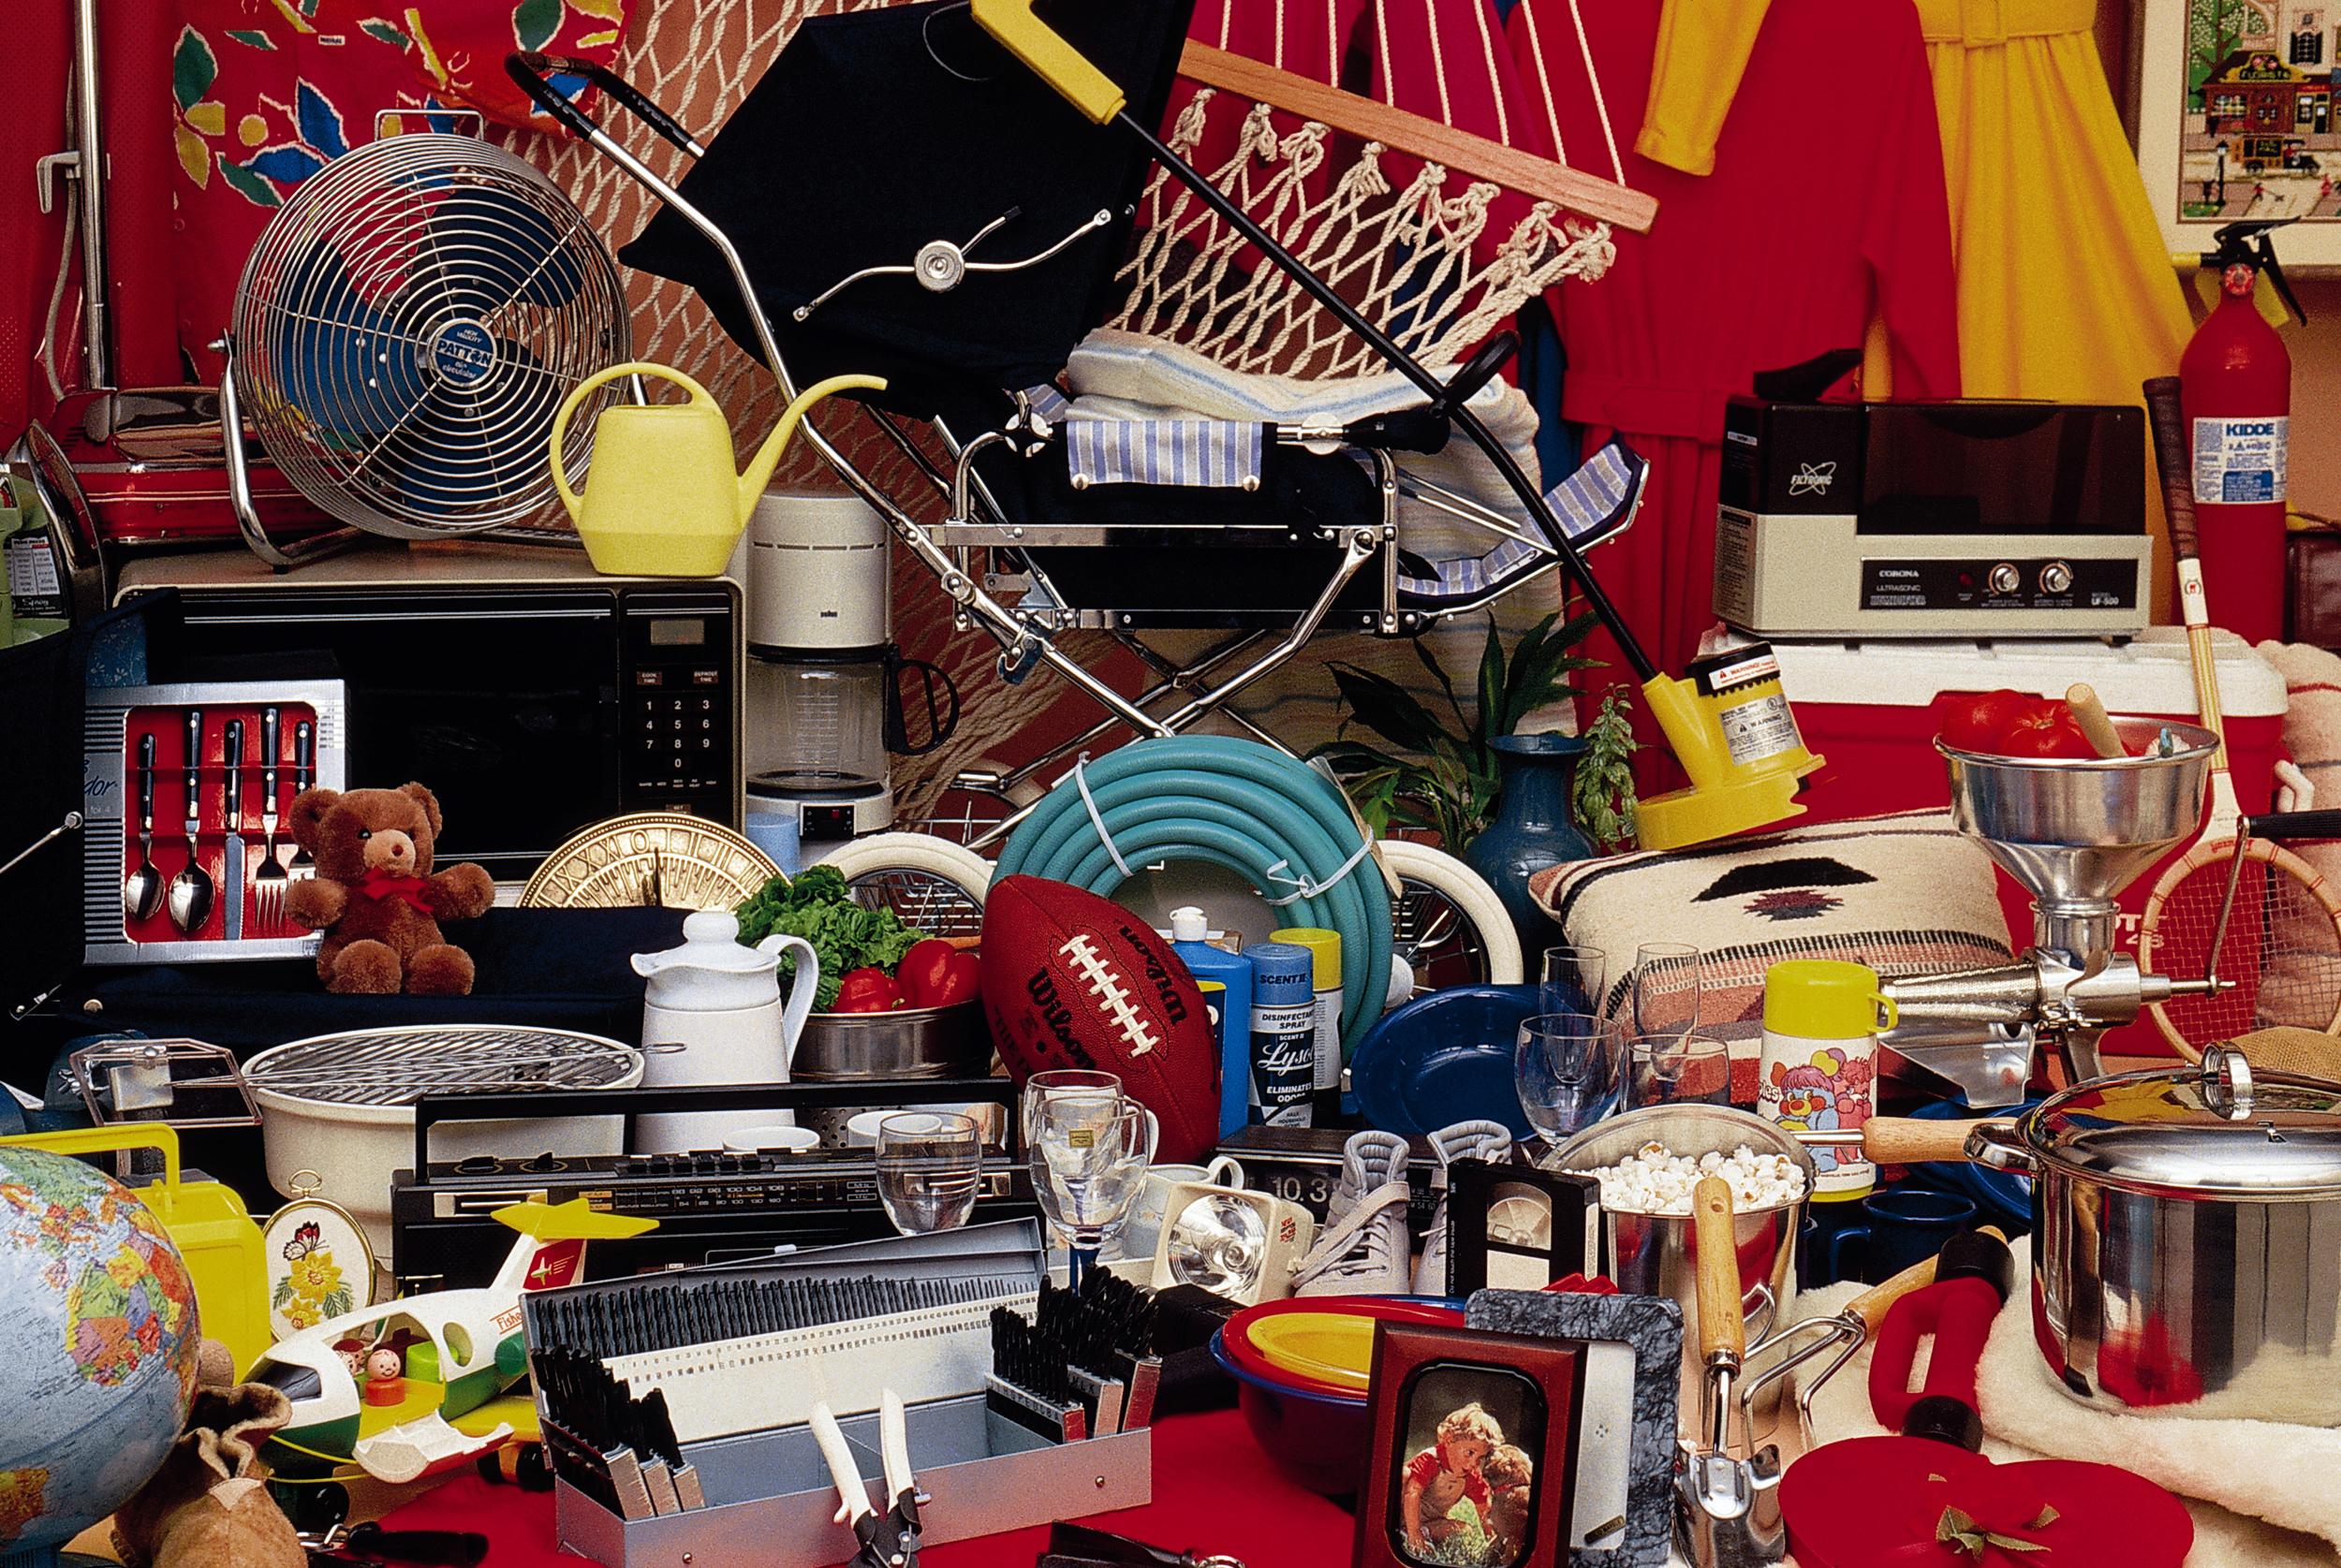 Where is YOUR junk drawer (closet, garage, attic, basement . . . )